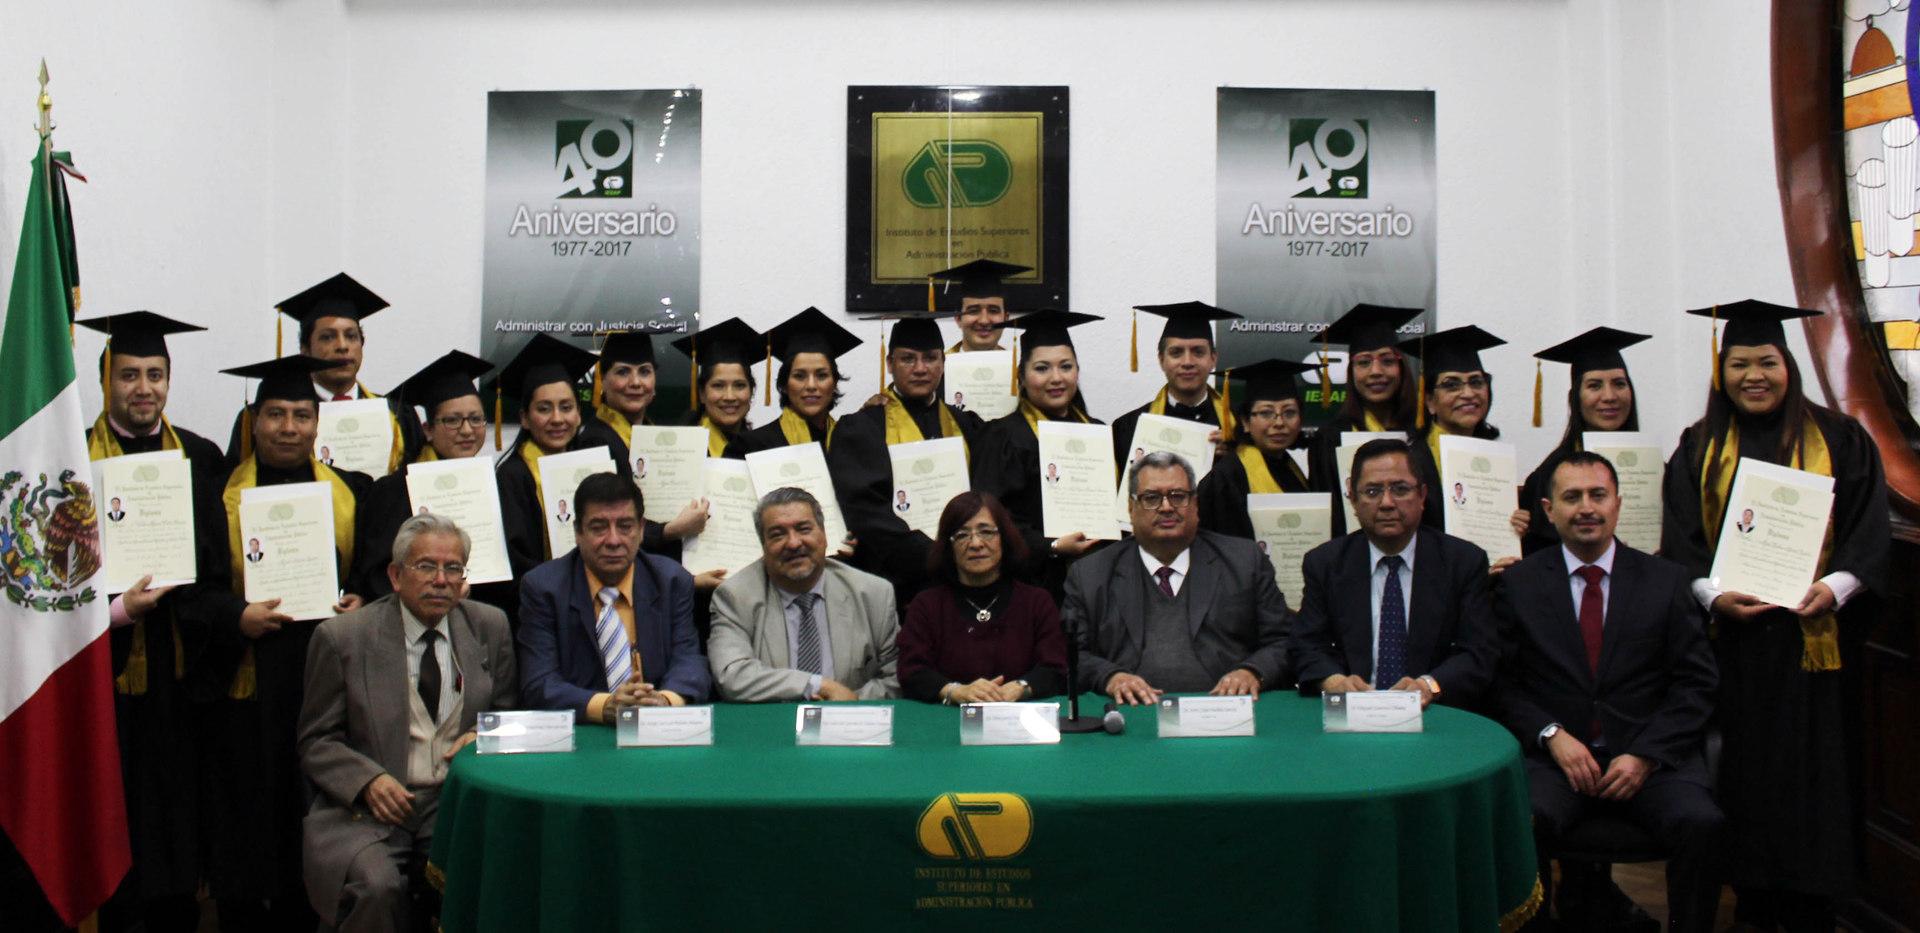 24_02_2018 Entrega de Diplomas MAHySP  B